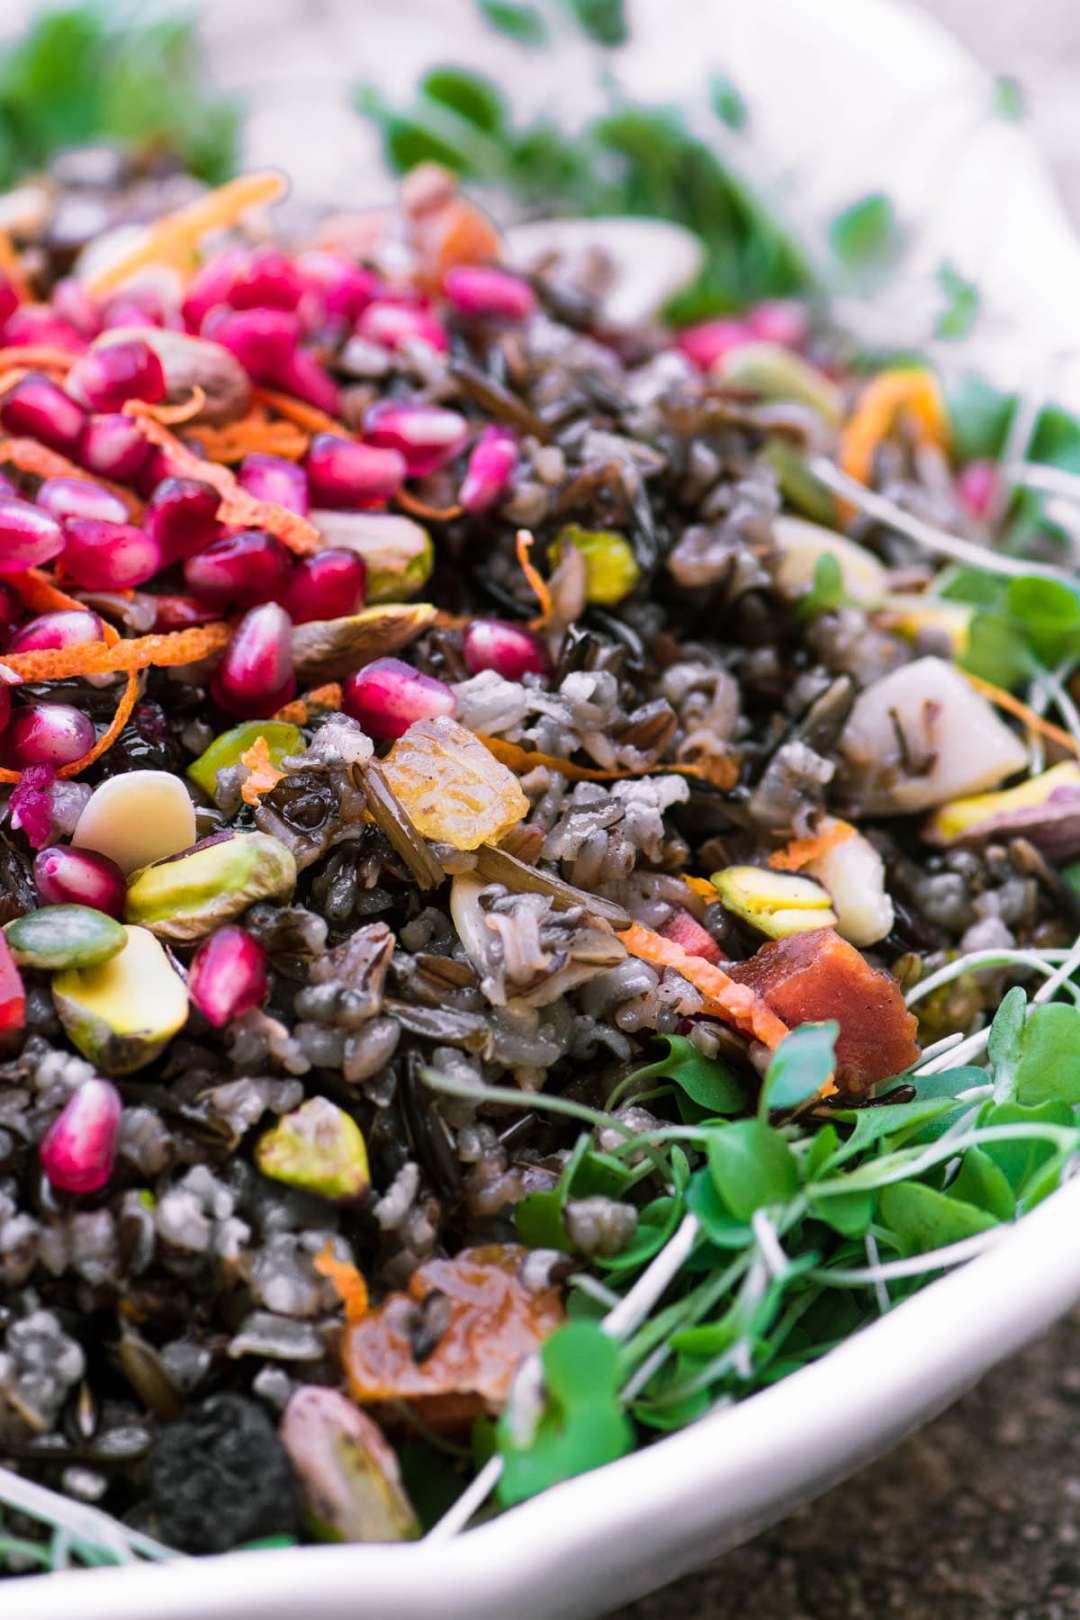 Jeweled Wild Rice Salad with microgreens and pomegranate